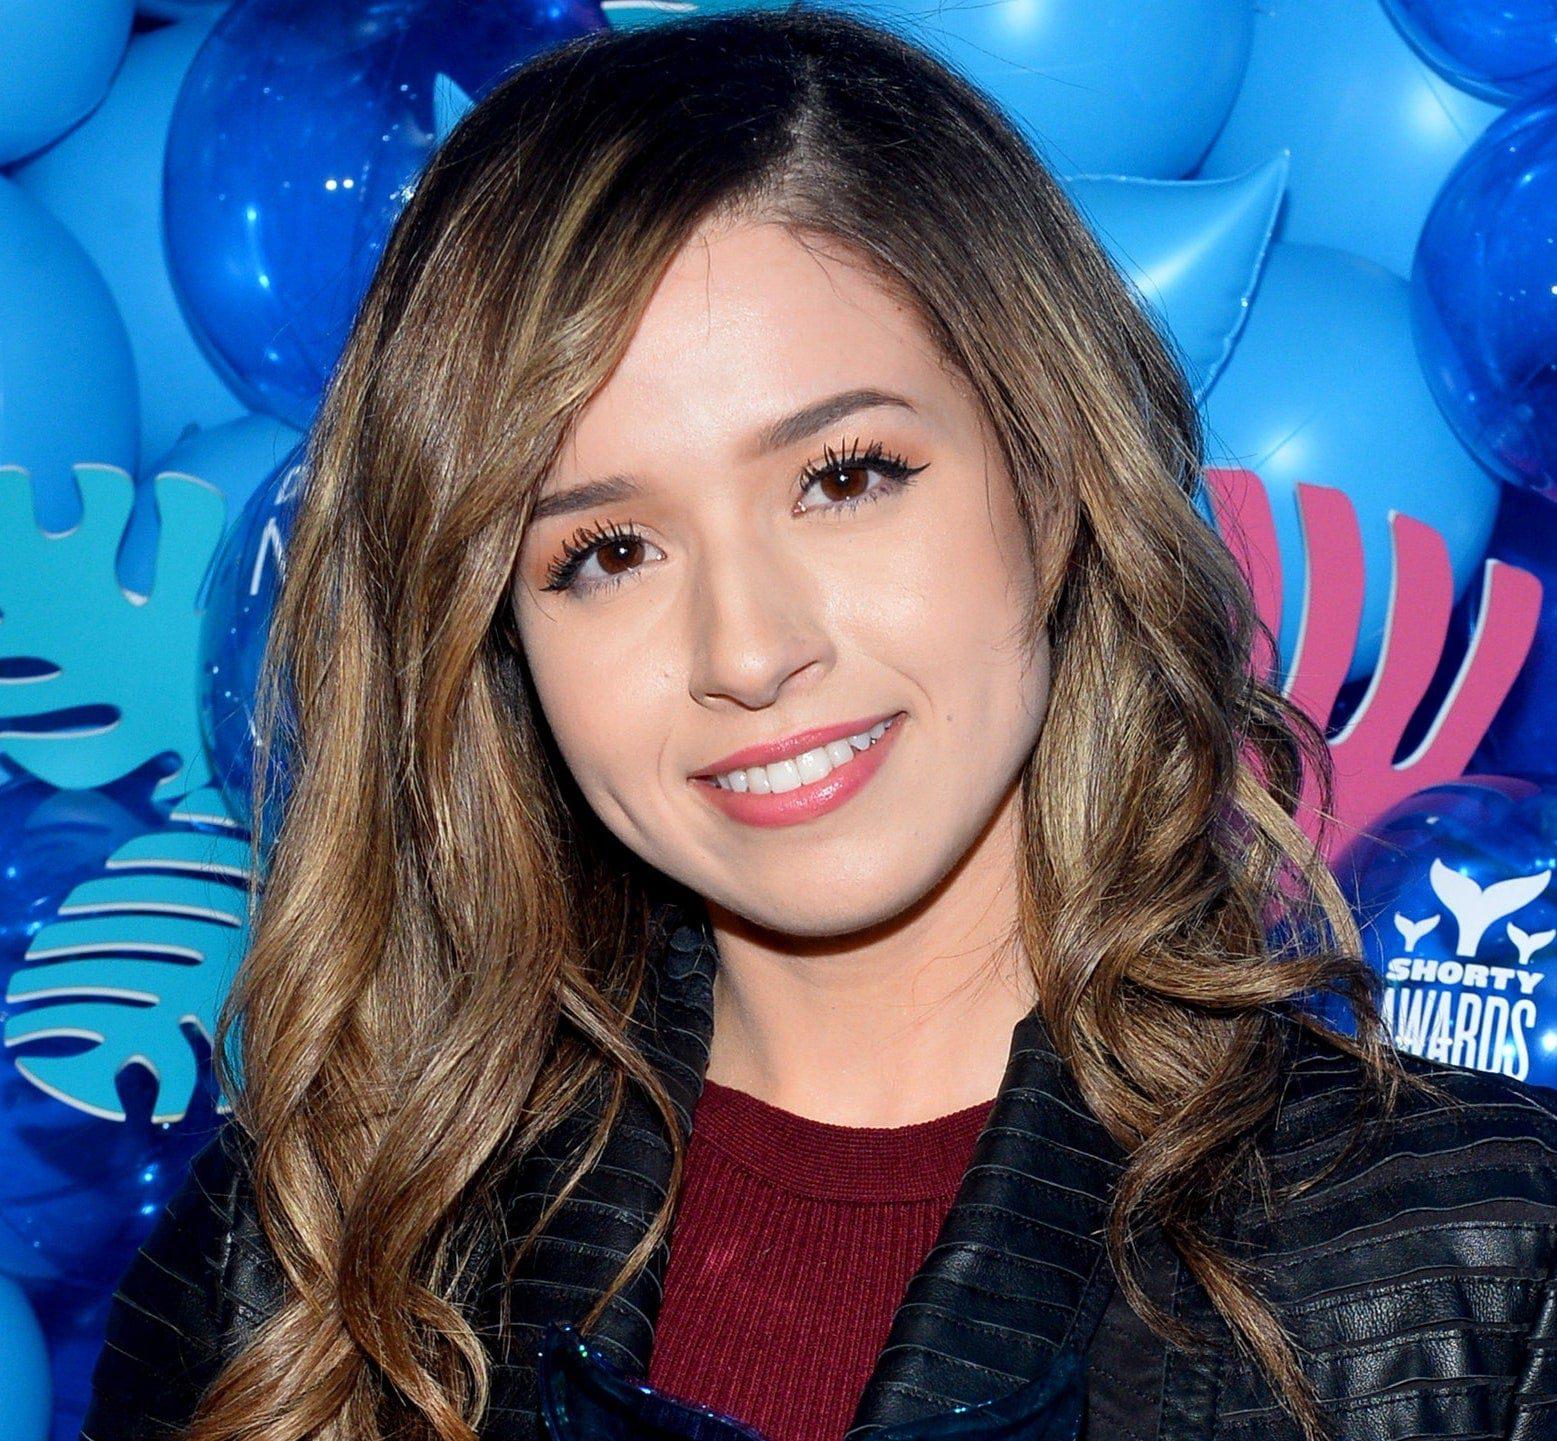 20 Hottest Girls On Twitch | Popular Twitch Girl Streamers